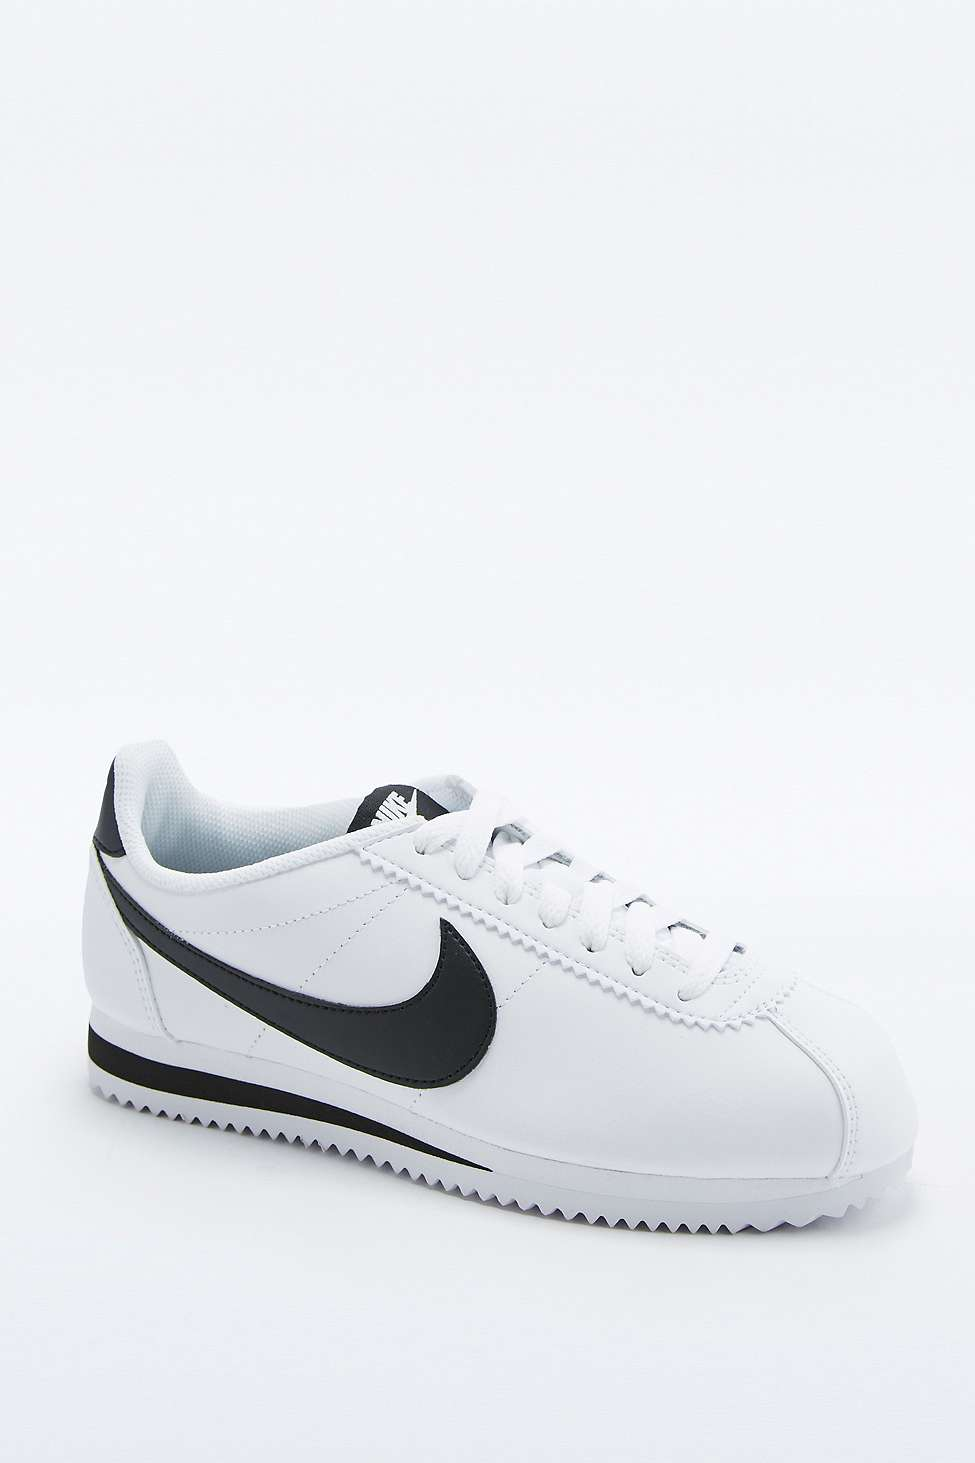 Nike Classic Cortez White Leather